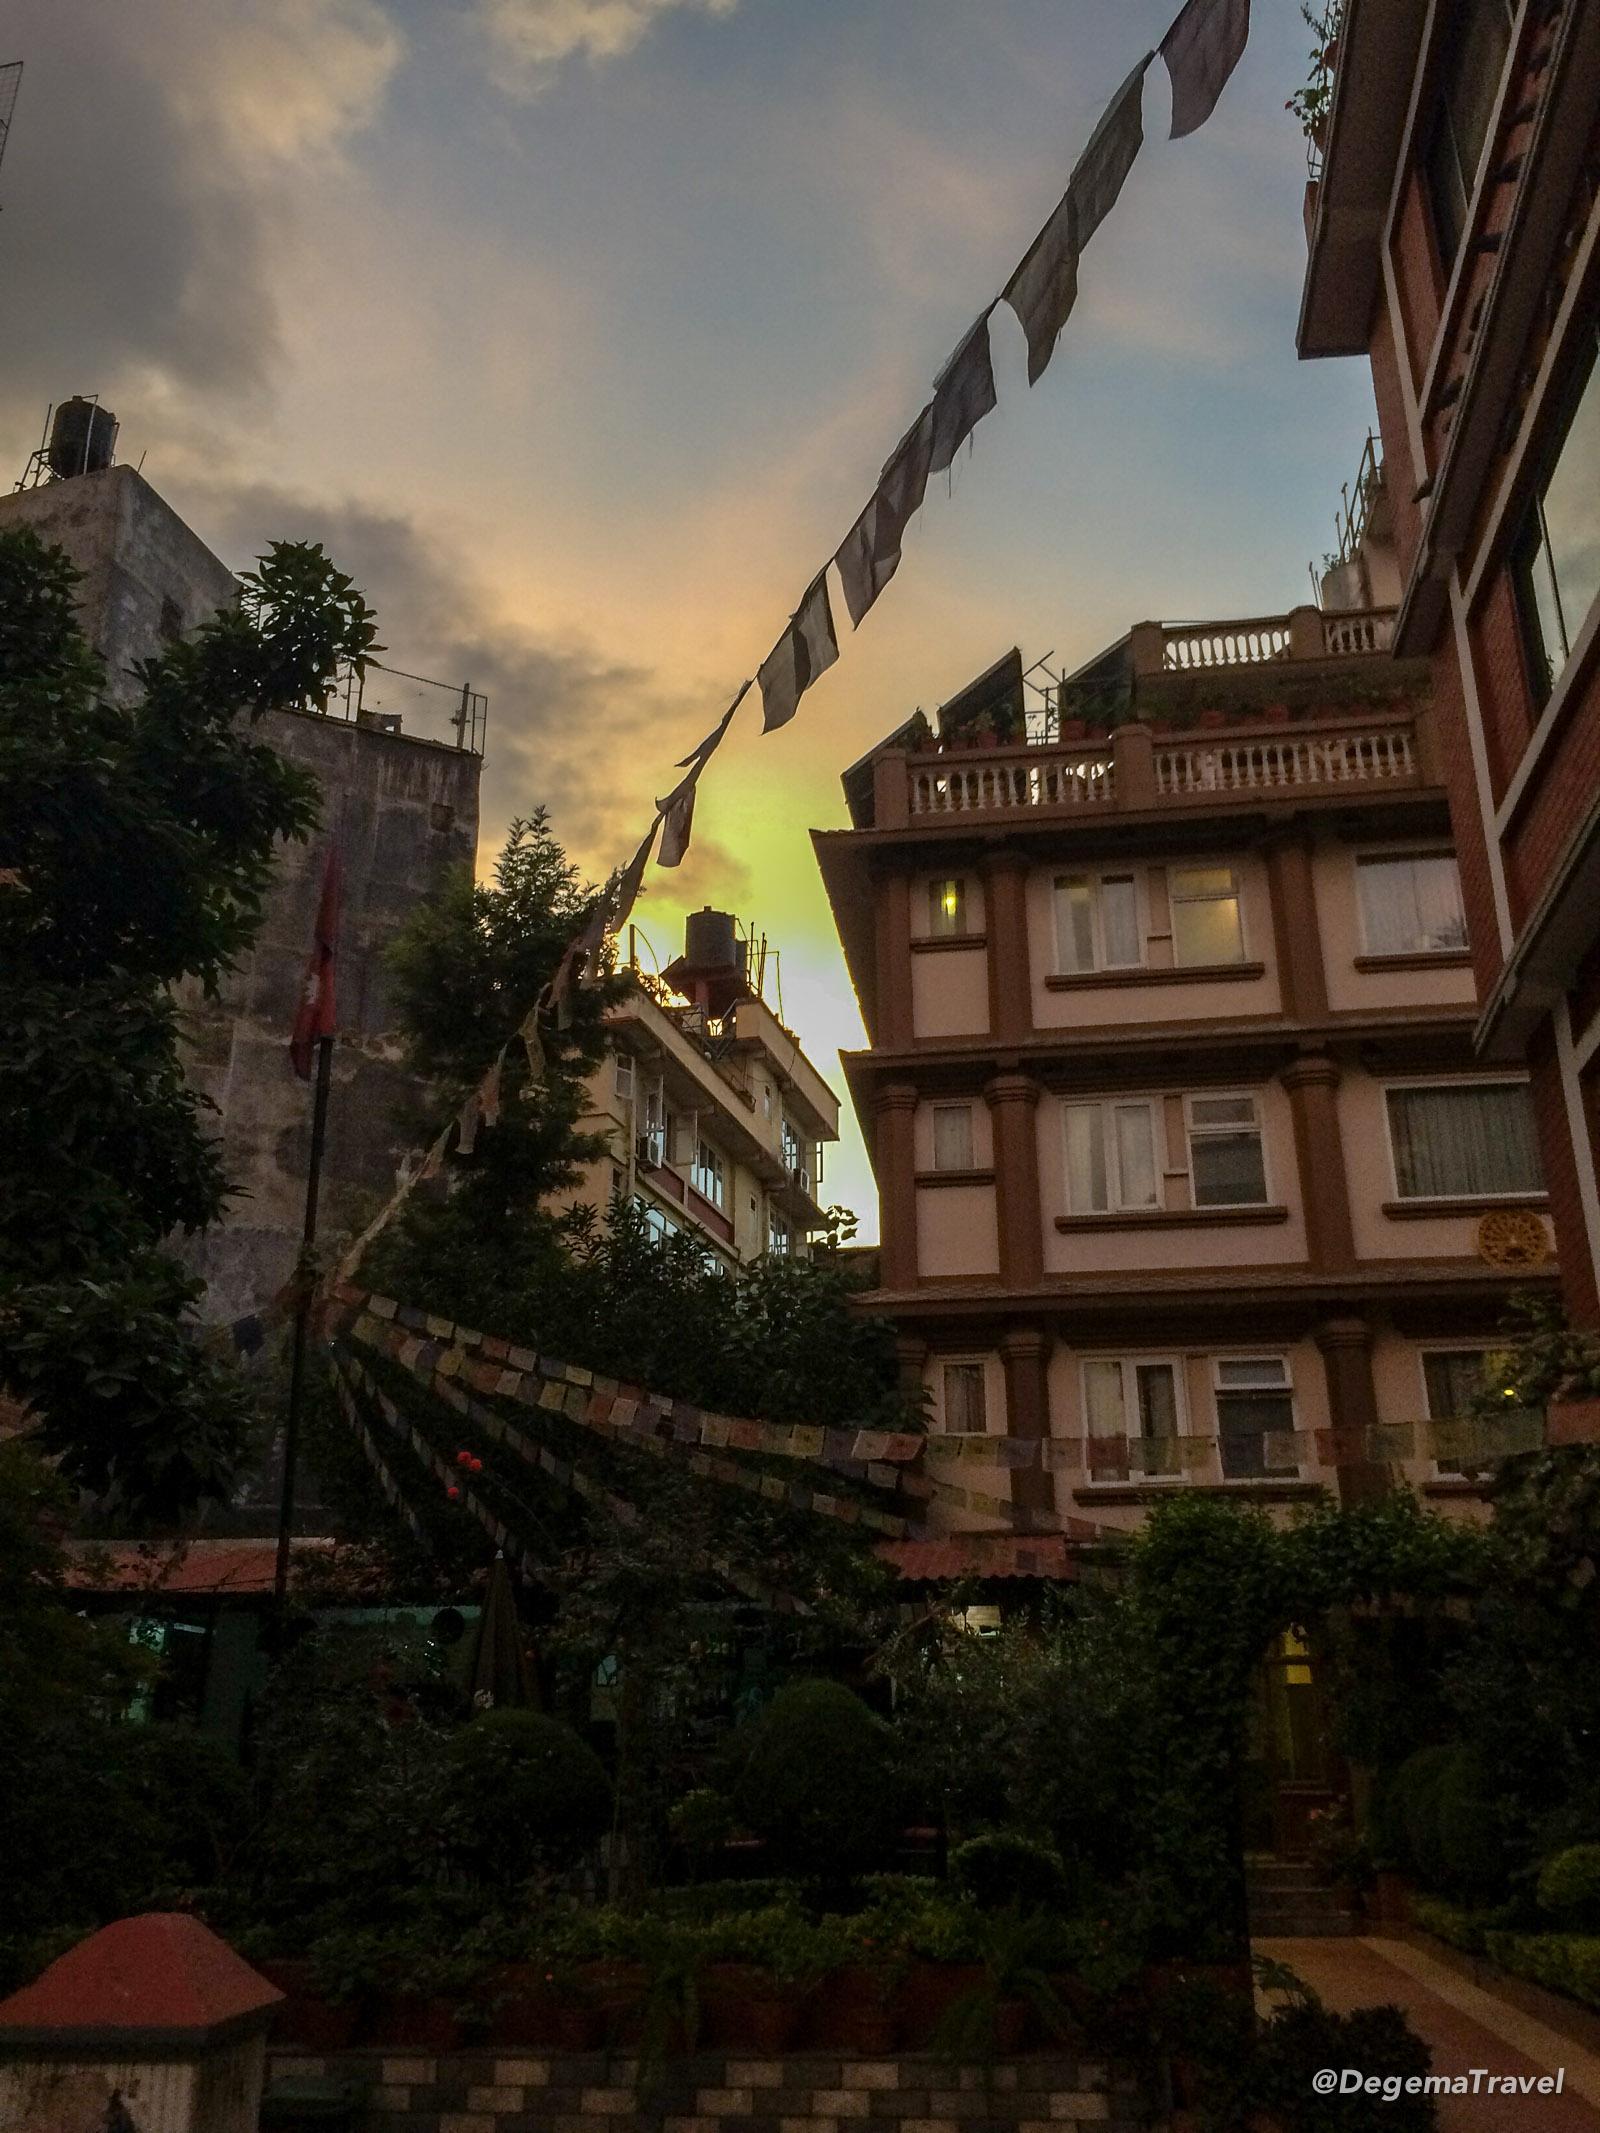 Sunset outside a hotel in Kathmandu, Nepal